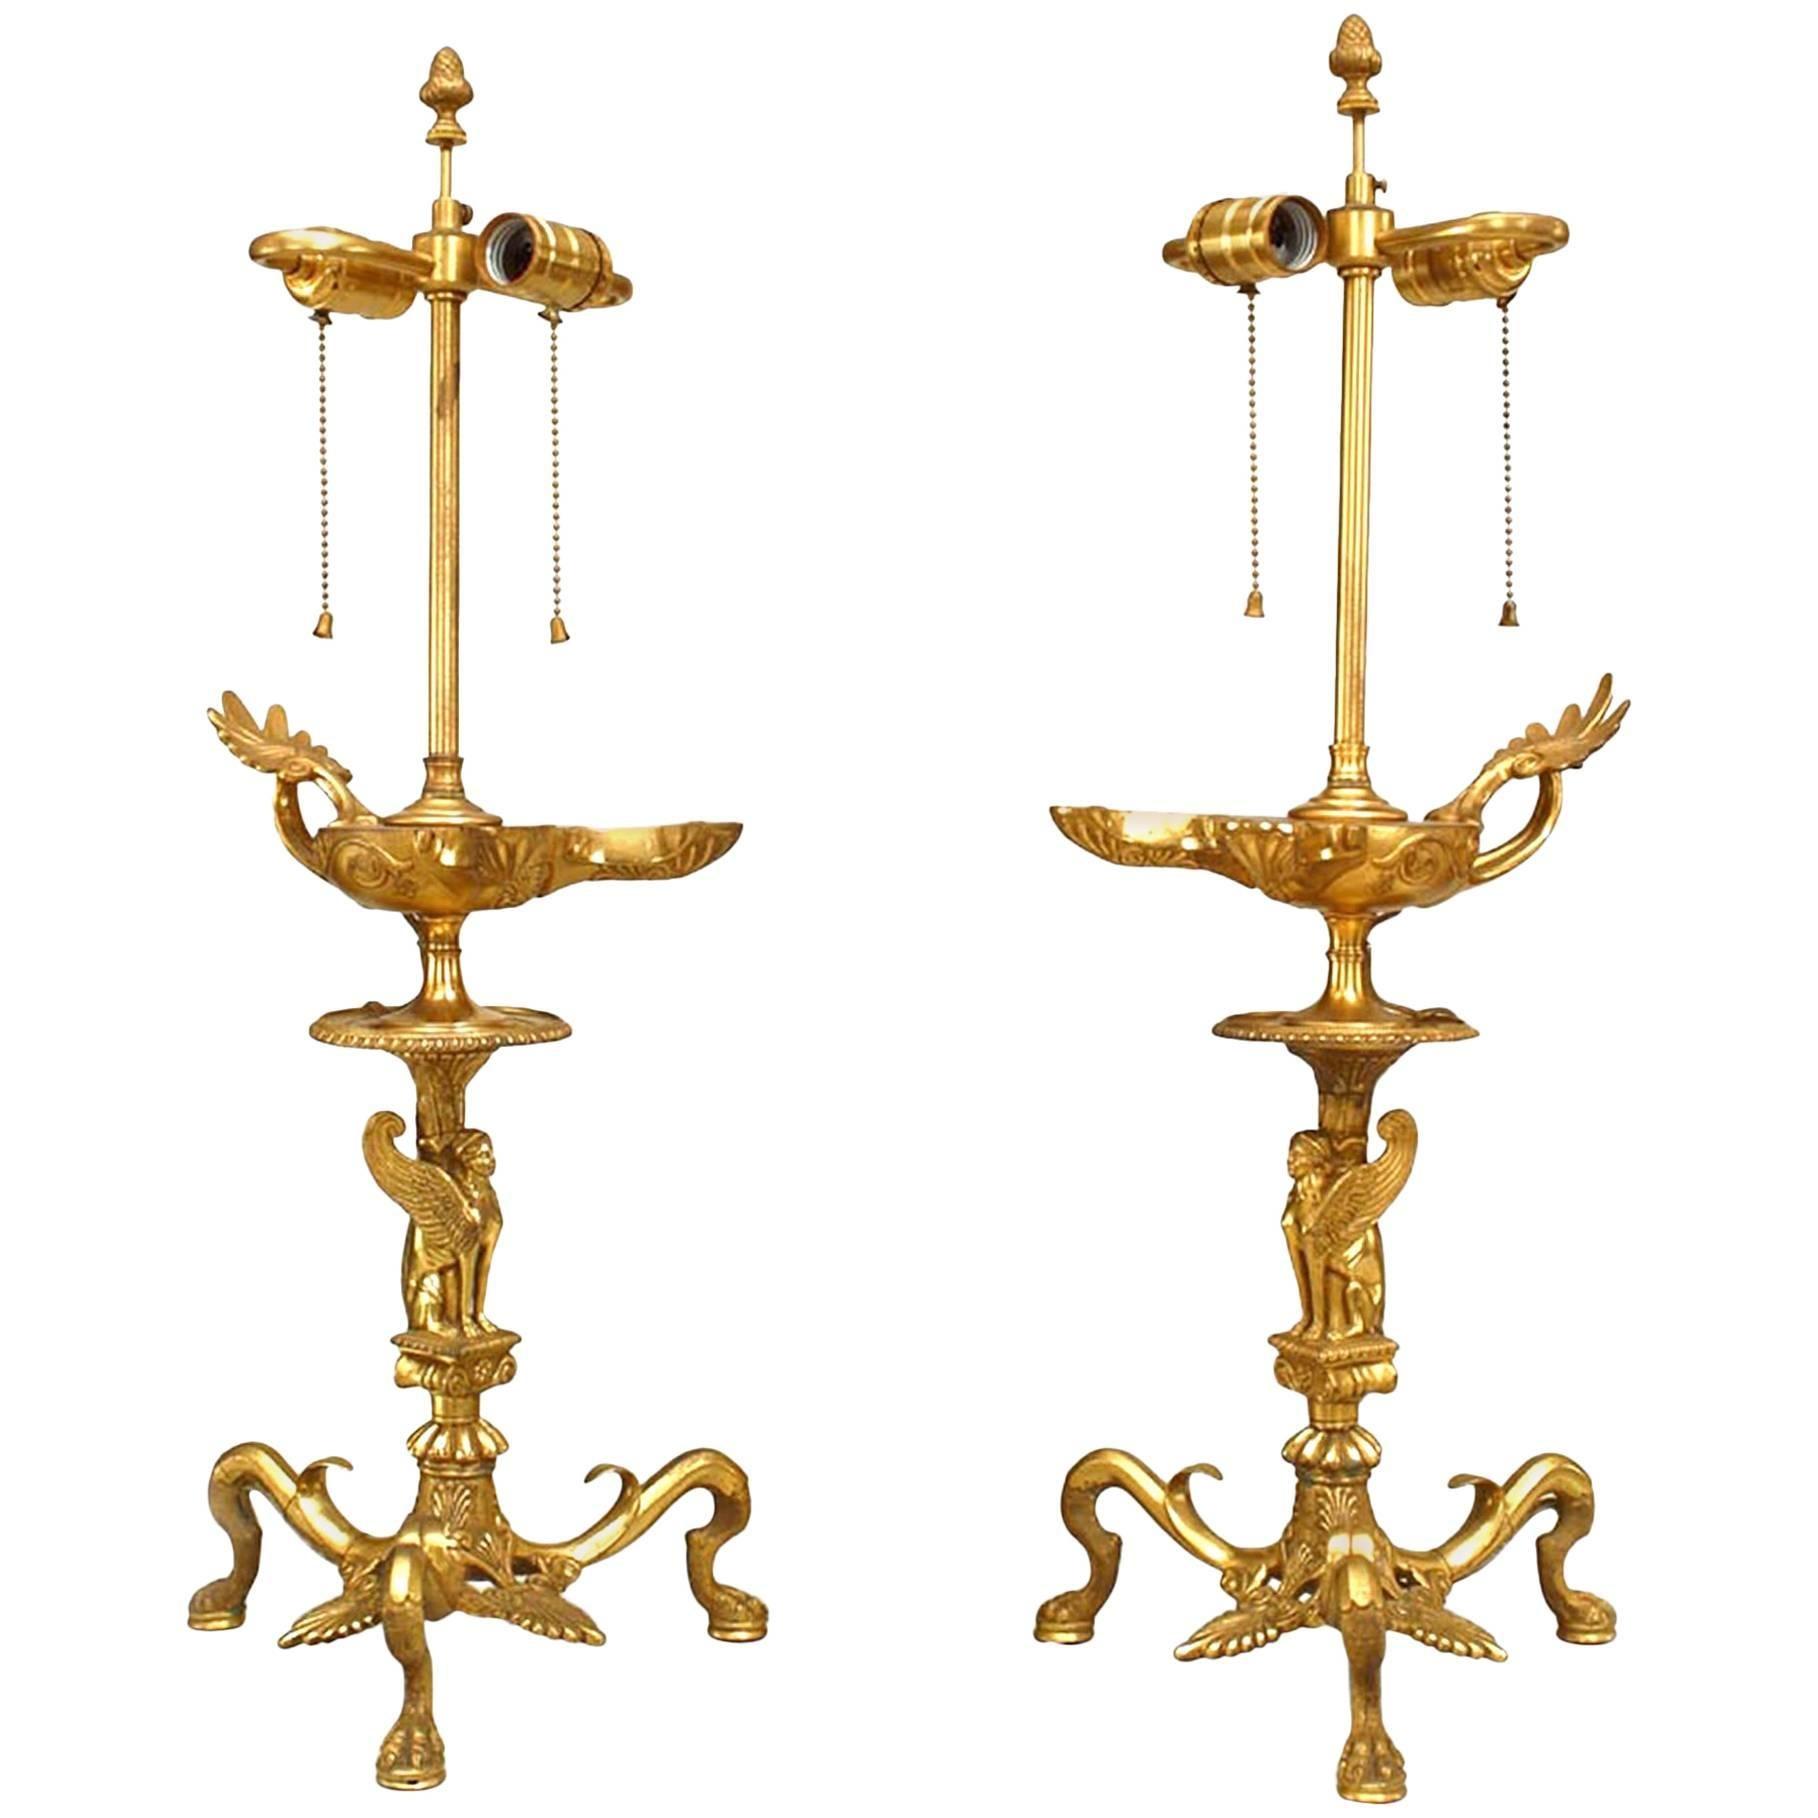 Pair of English Regency Gilt Bronze Sphinx Table Lamps